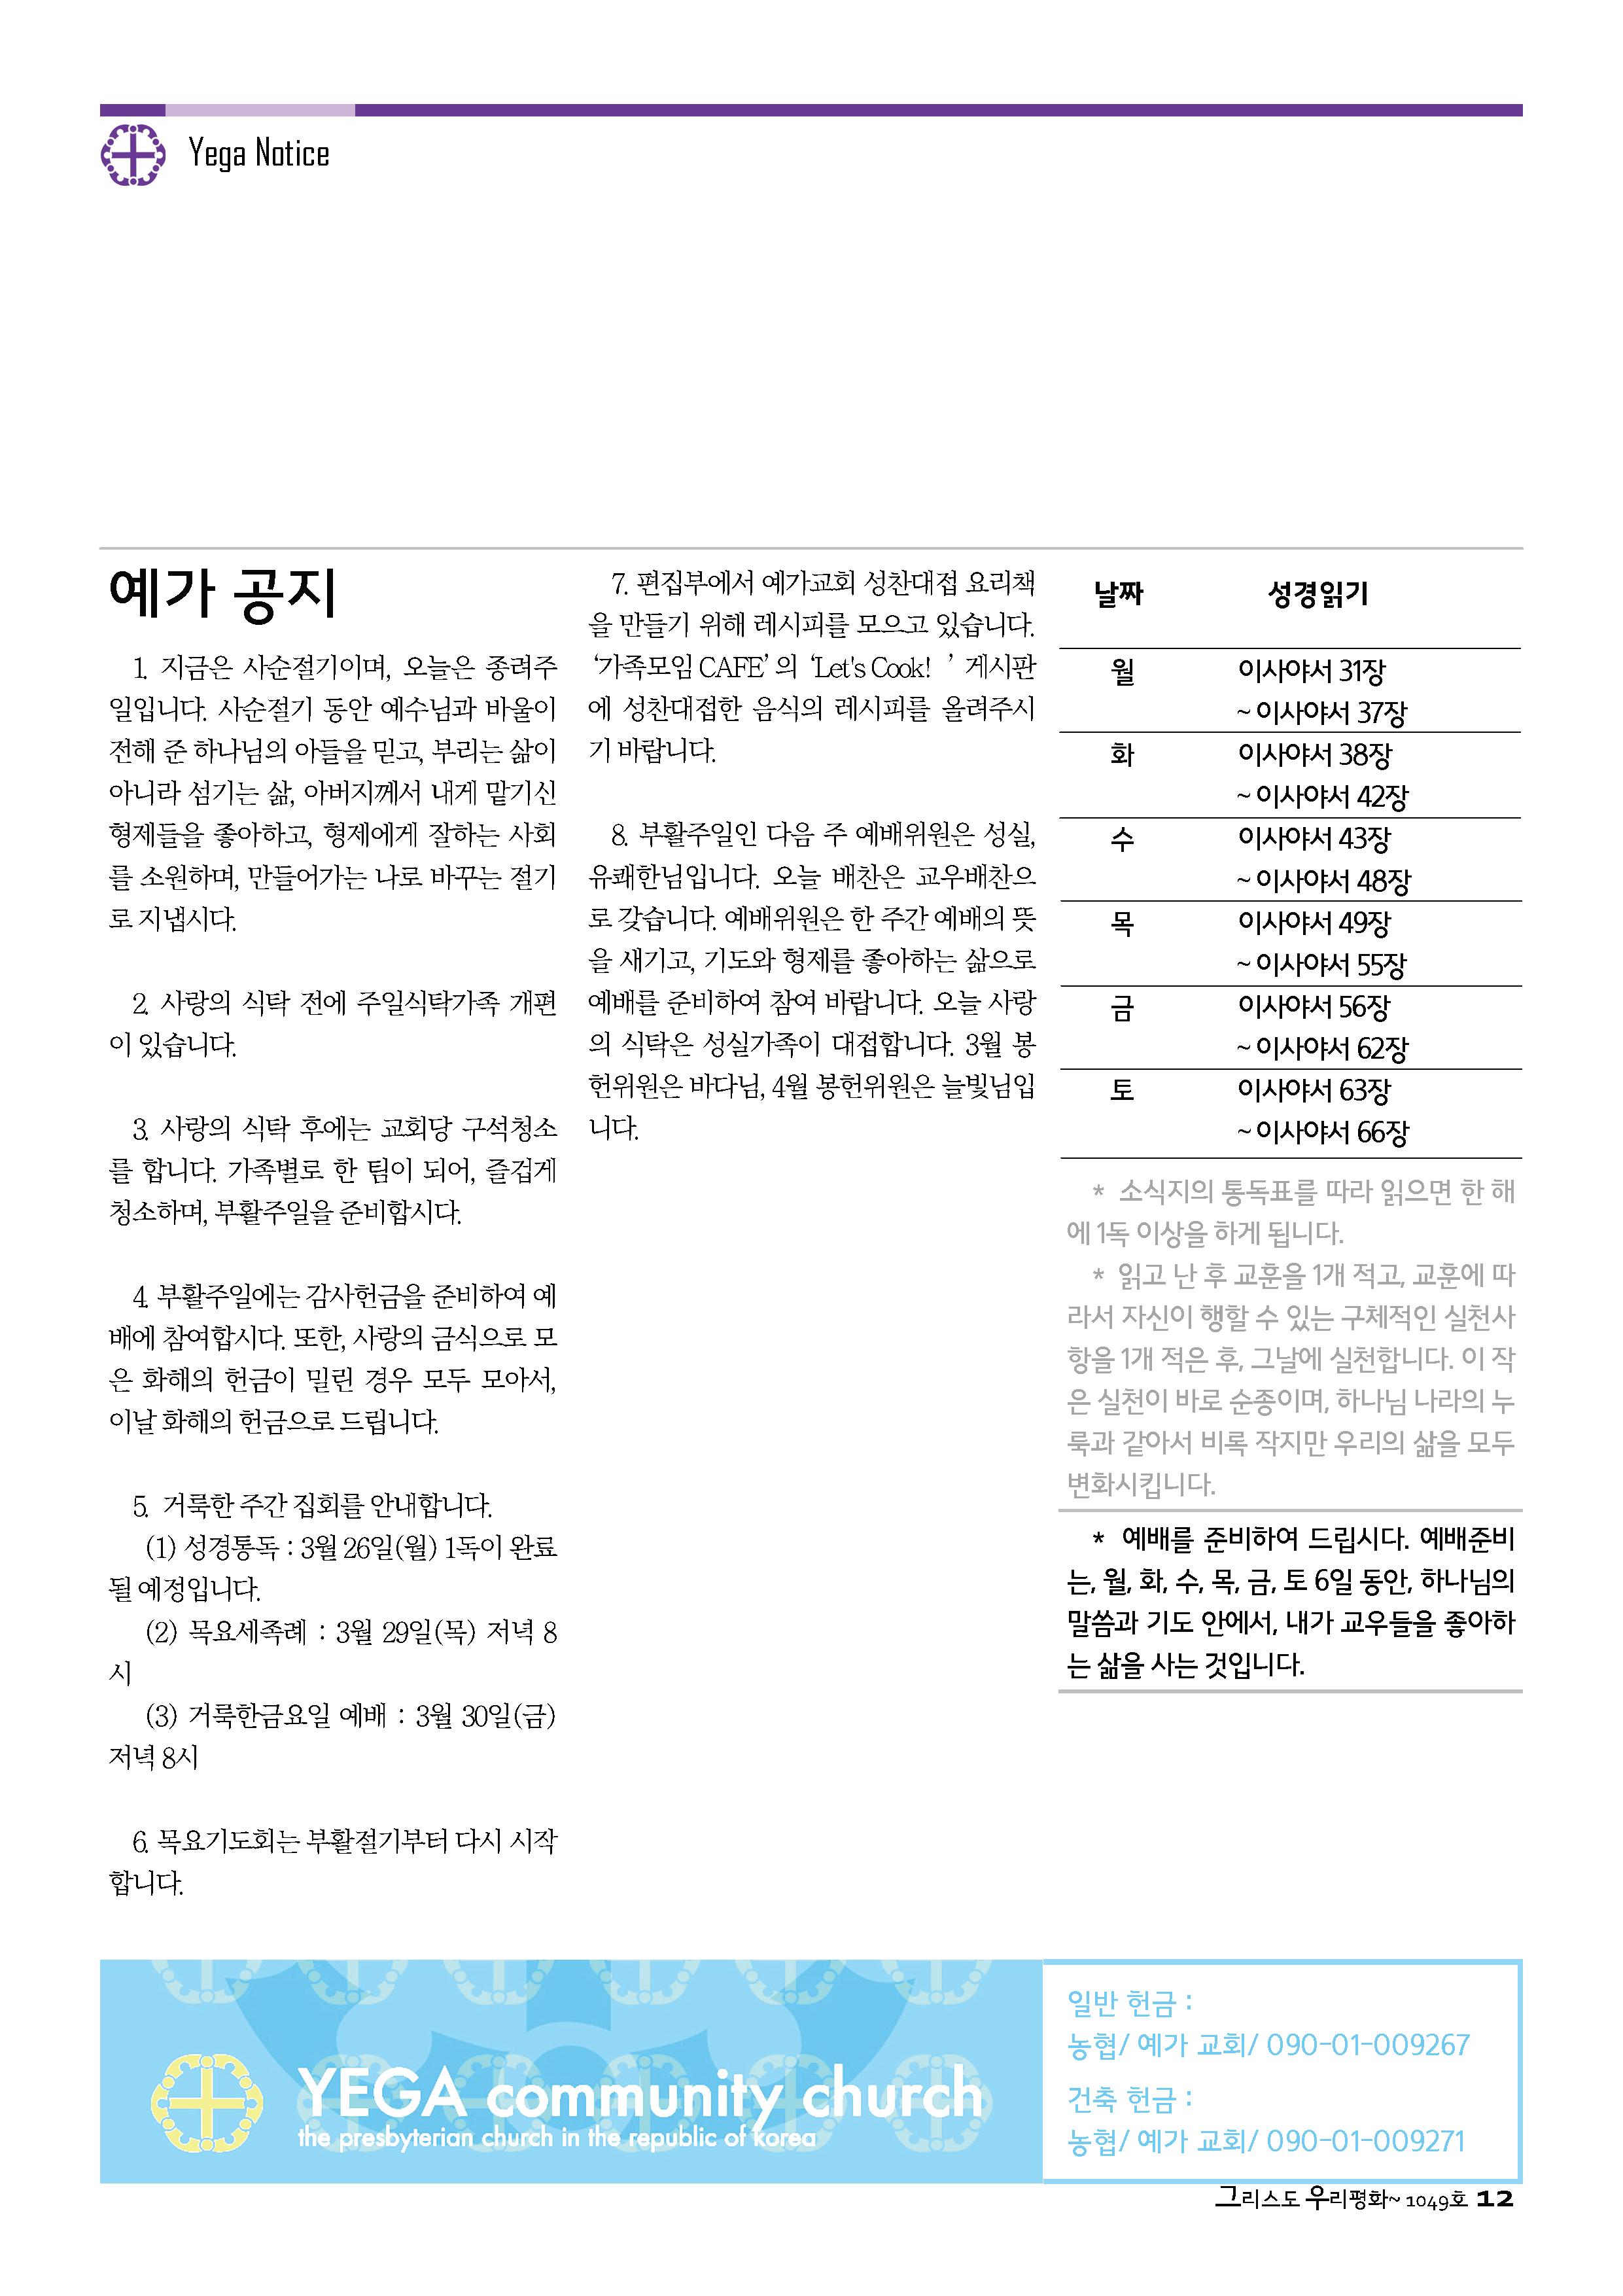 18sdjb0325_페이지_12.png